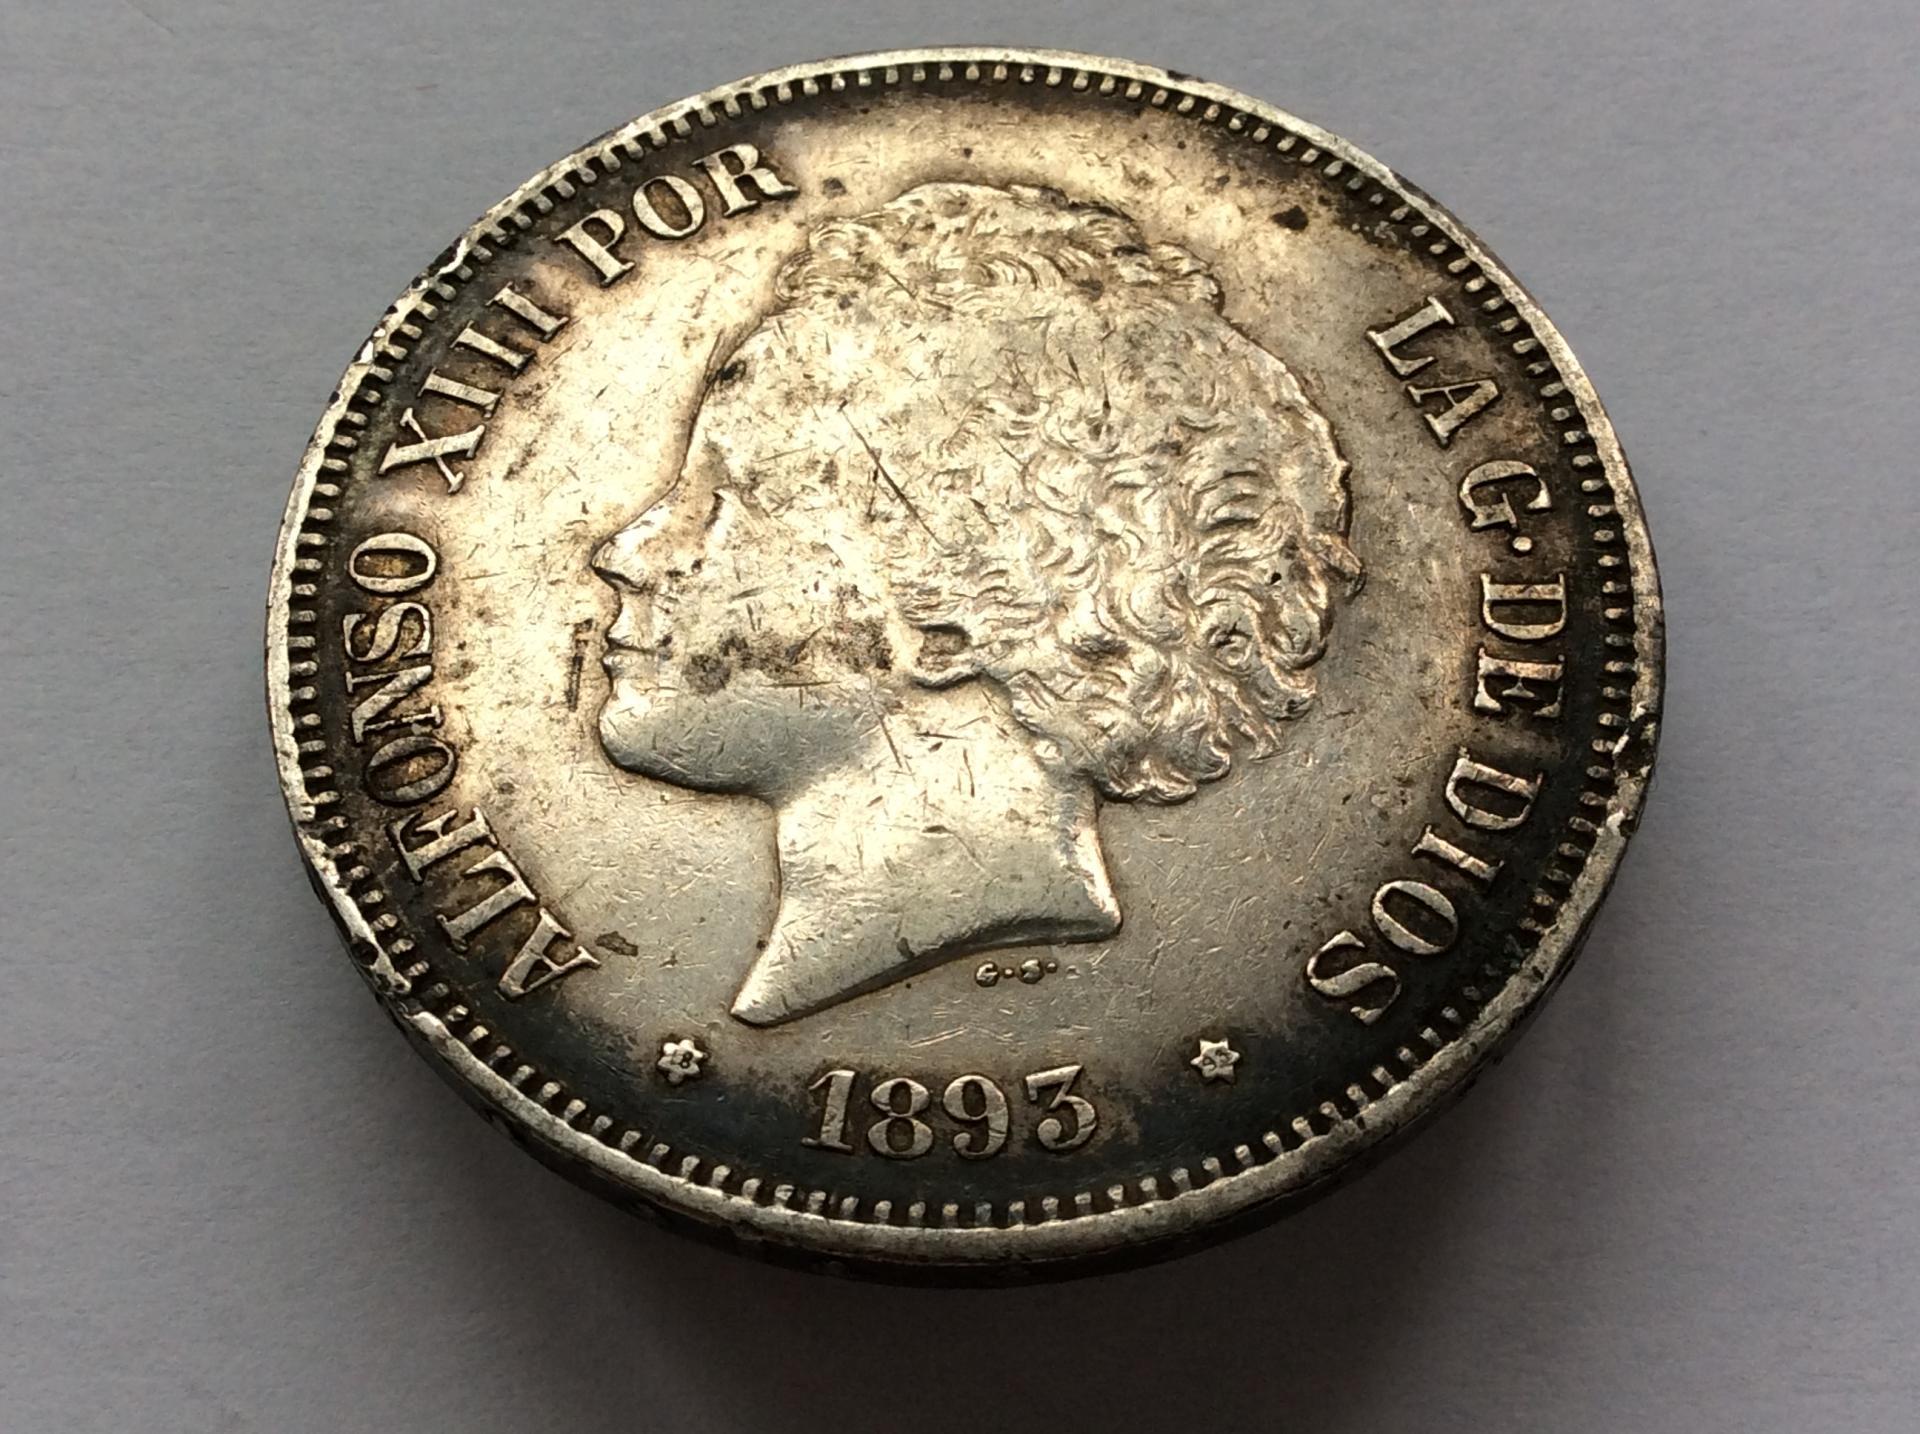 5 PESETAS 1893 *18*93 - PGL - ALFONSO XIII - BUCLES